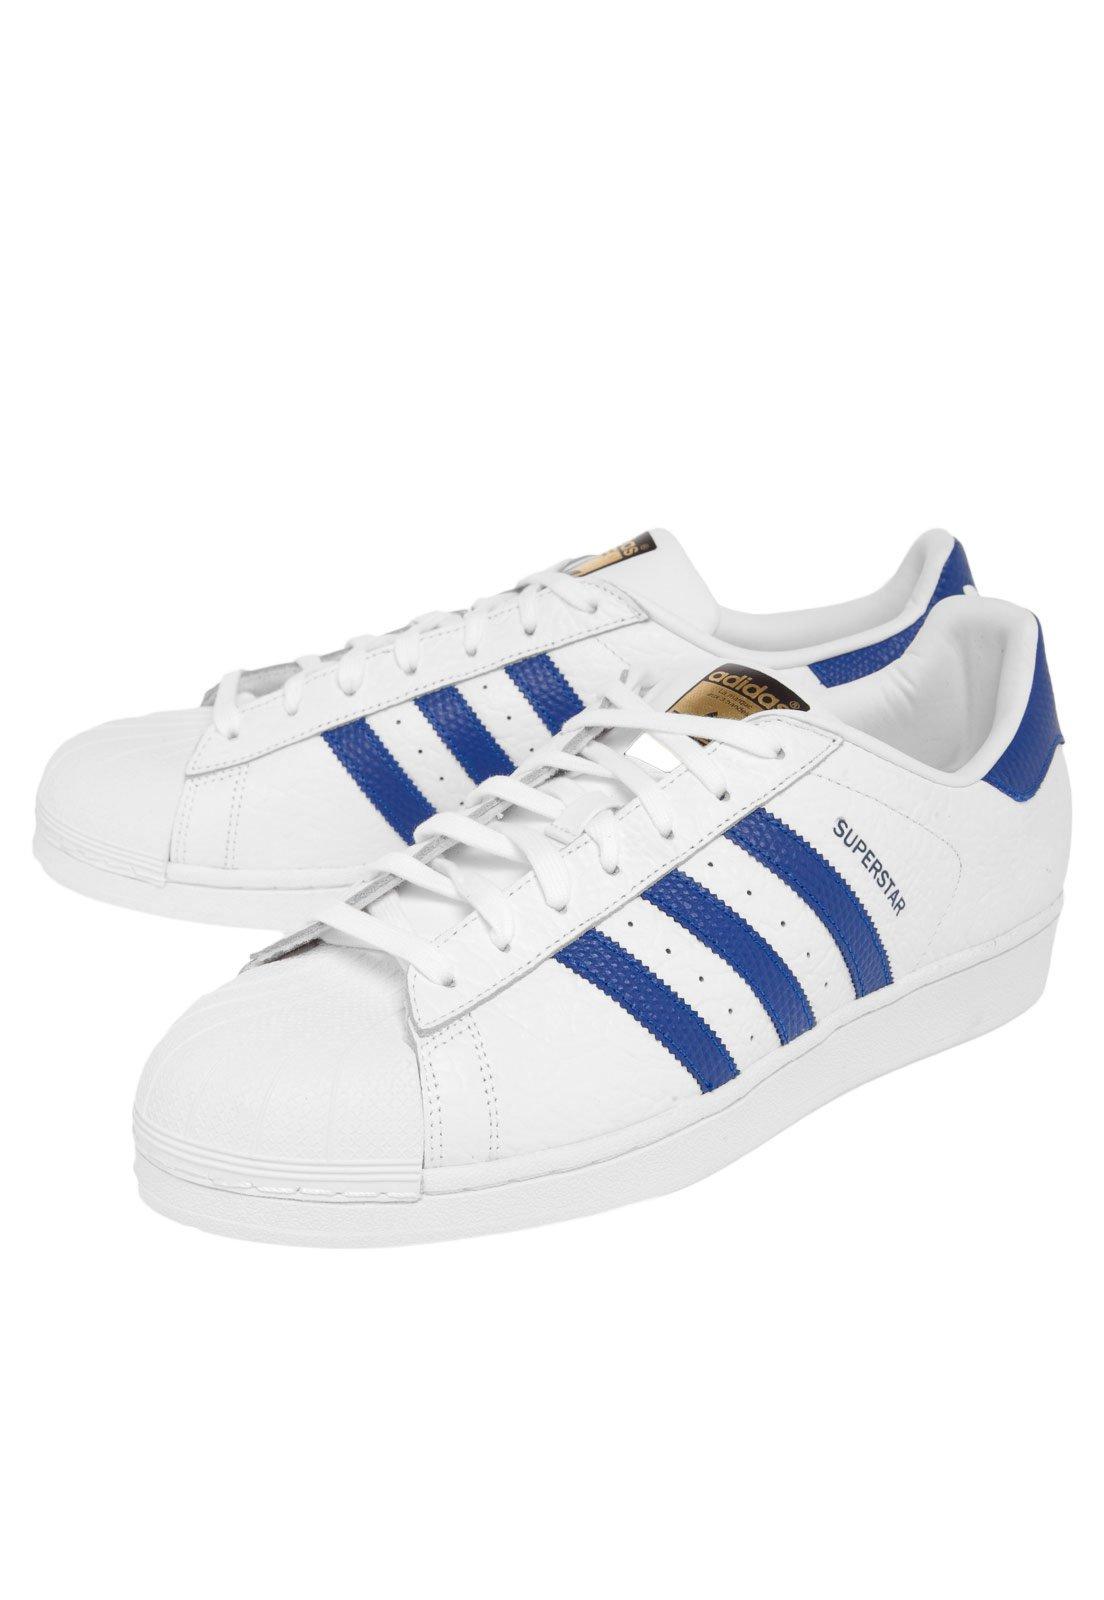 envio GRATIS a todo el mundo envío complementario zapatos clasicos Tênis adidas Originals Superstar Branco - Compre Agora   Dafiti Brasil